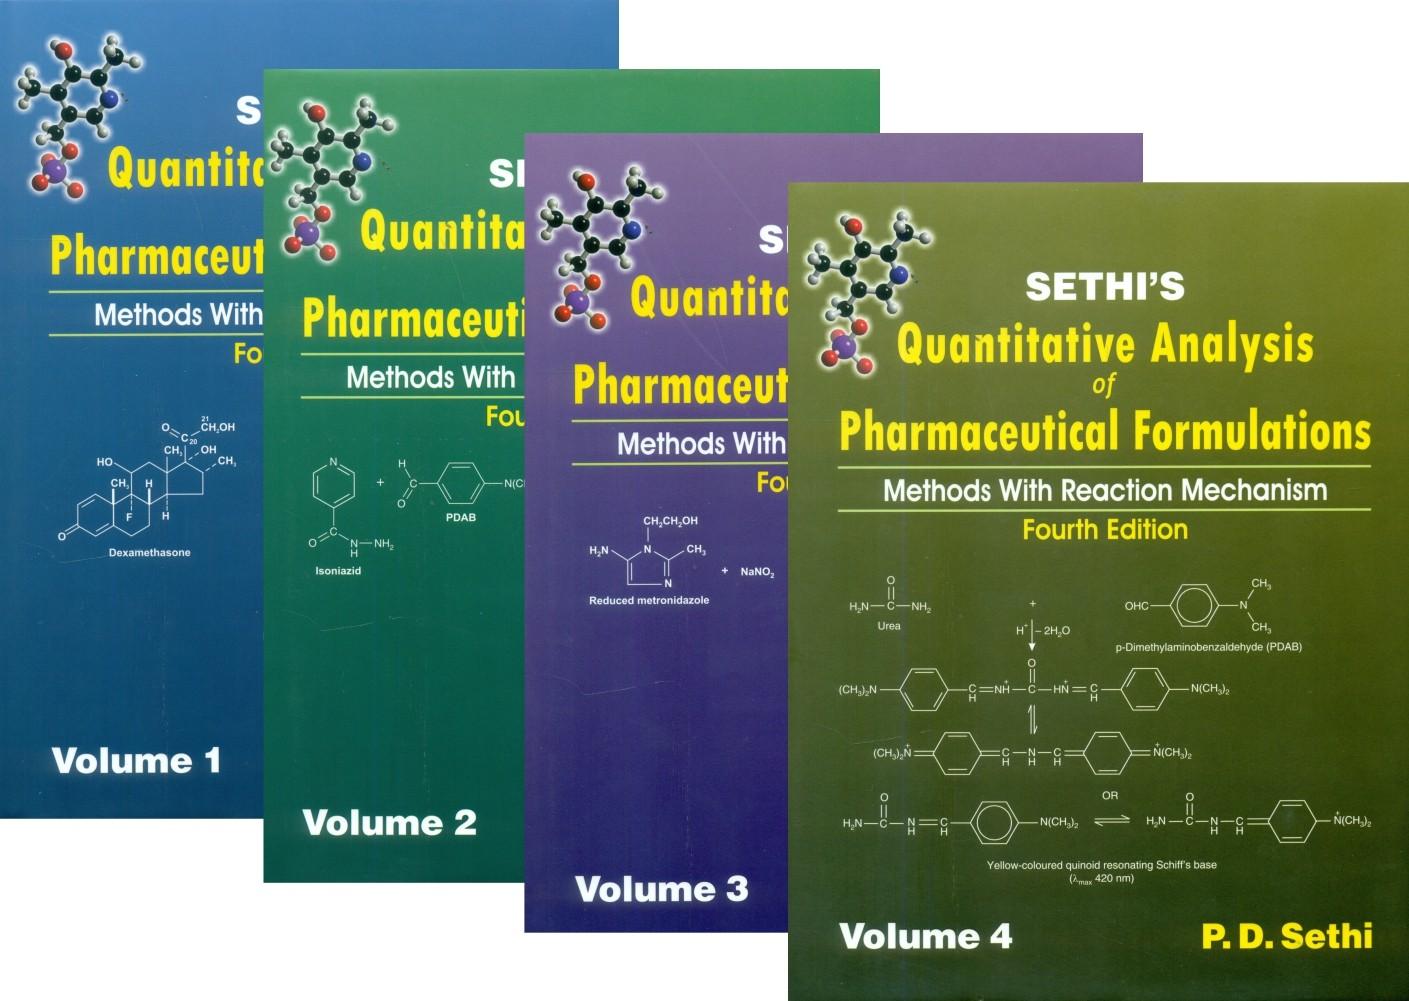 Sethi's Quantitative Analysis Of Pharmaceutical Formulations Methods With Reaction Mechanism 4Ed 4 Vol. Set (Hb)